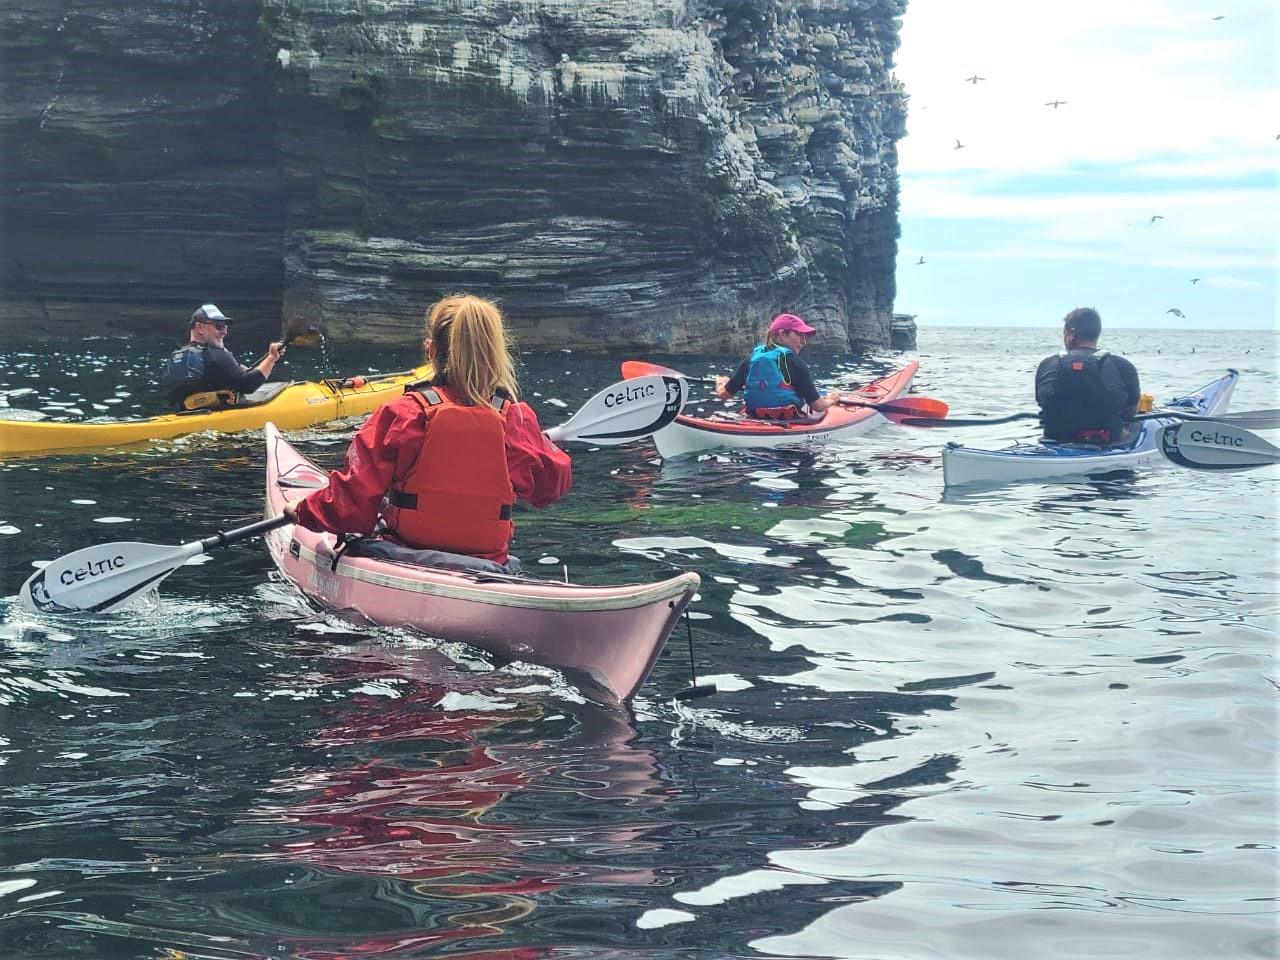 Guillamot spotting in kayaks